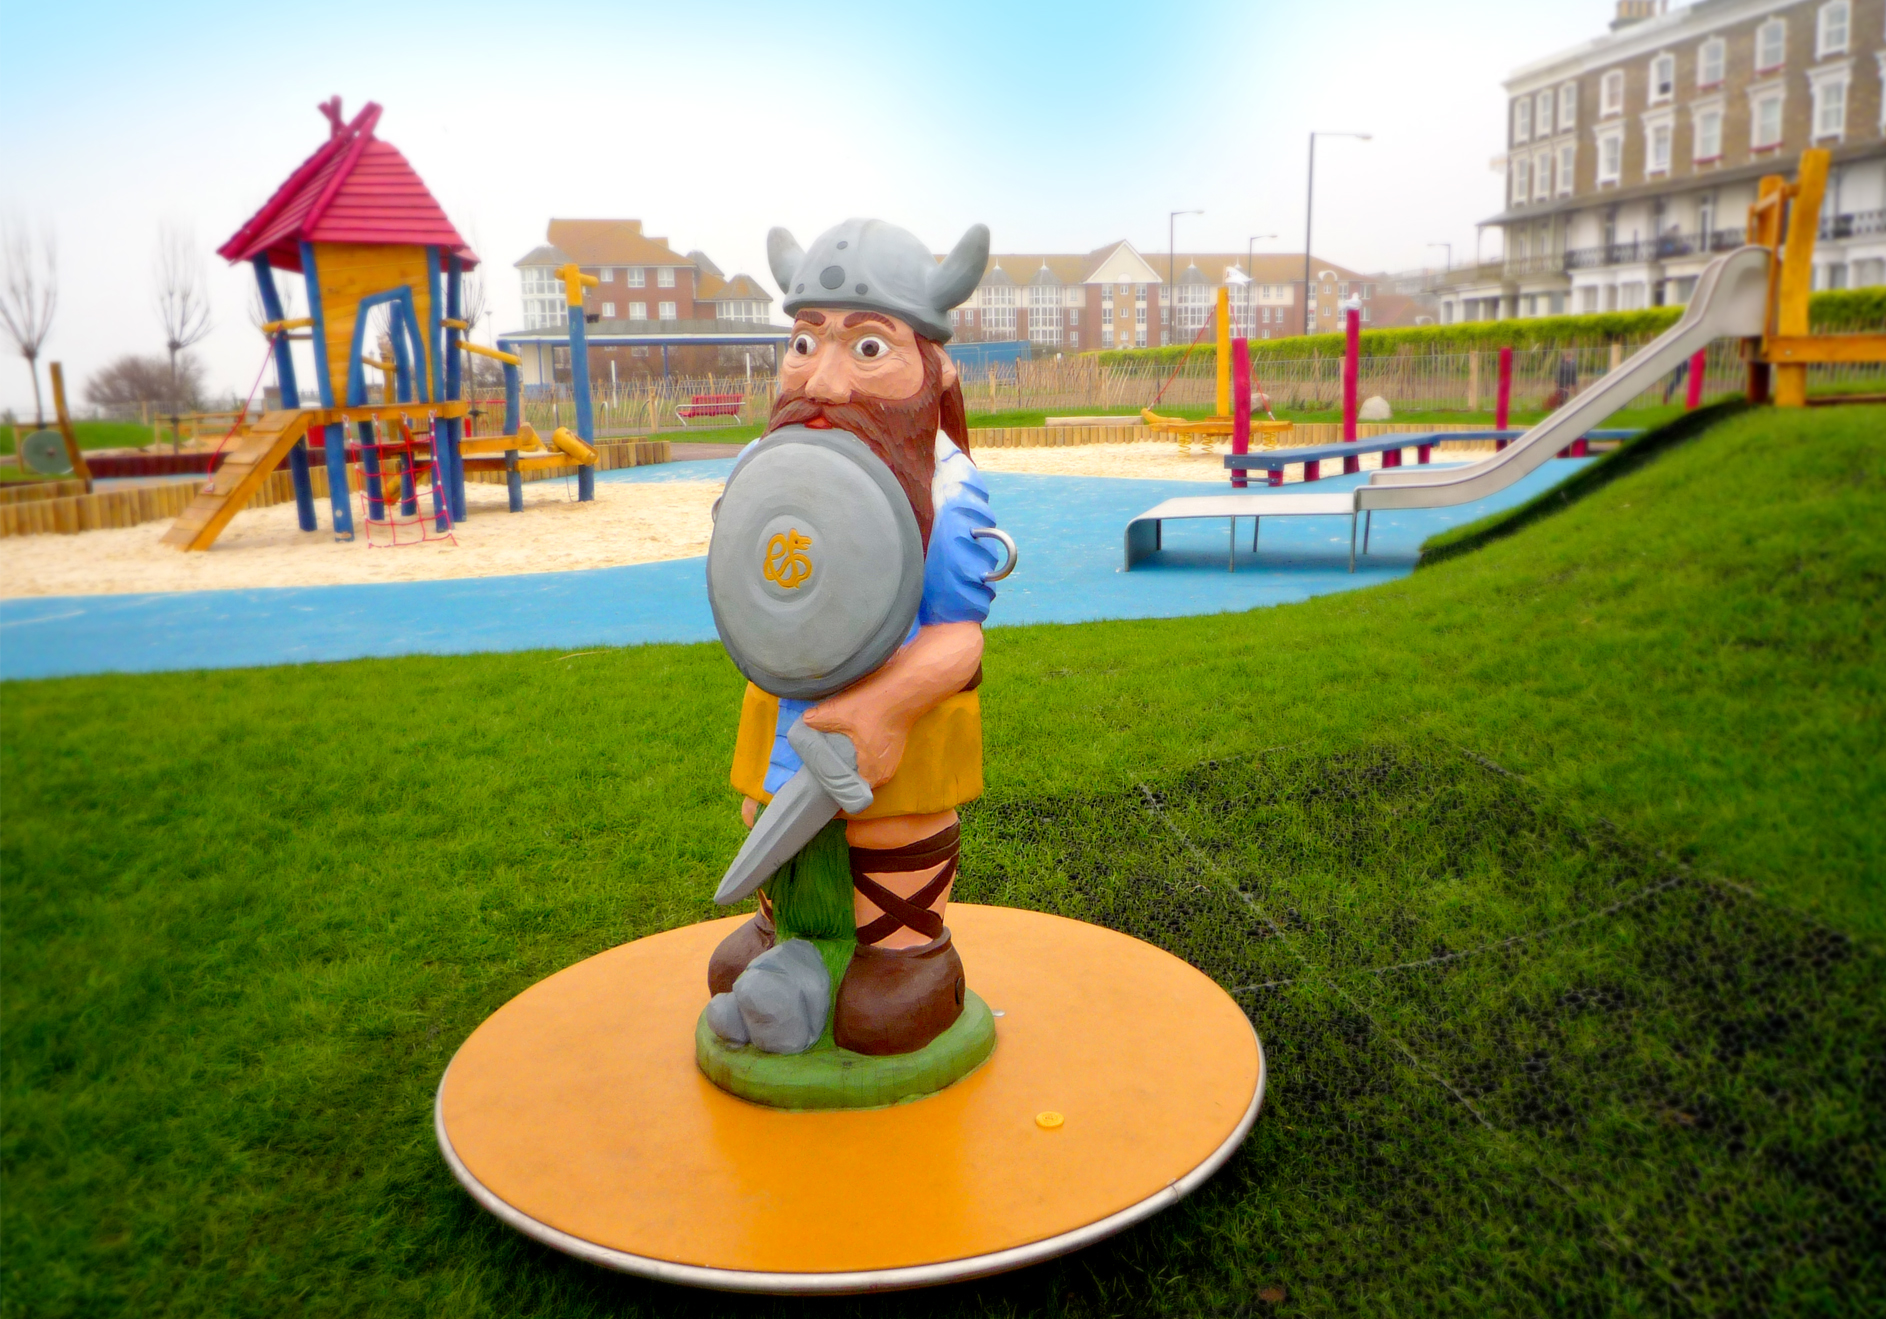 Newgate Play Area Margate The Children S Playground Company